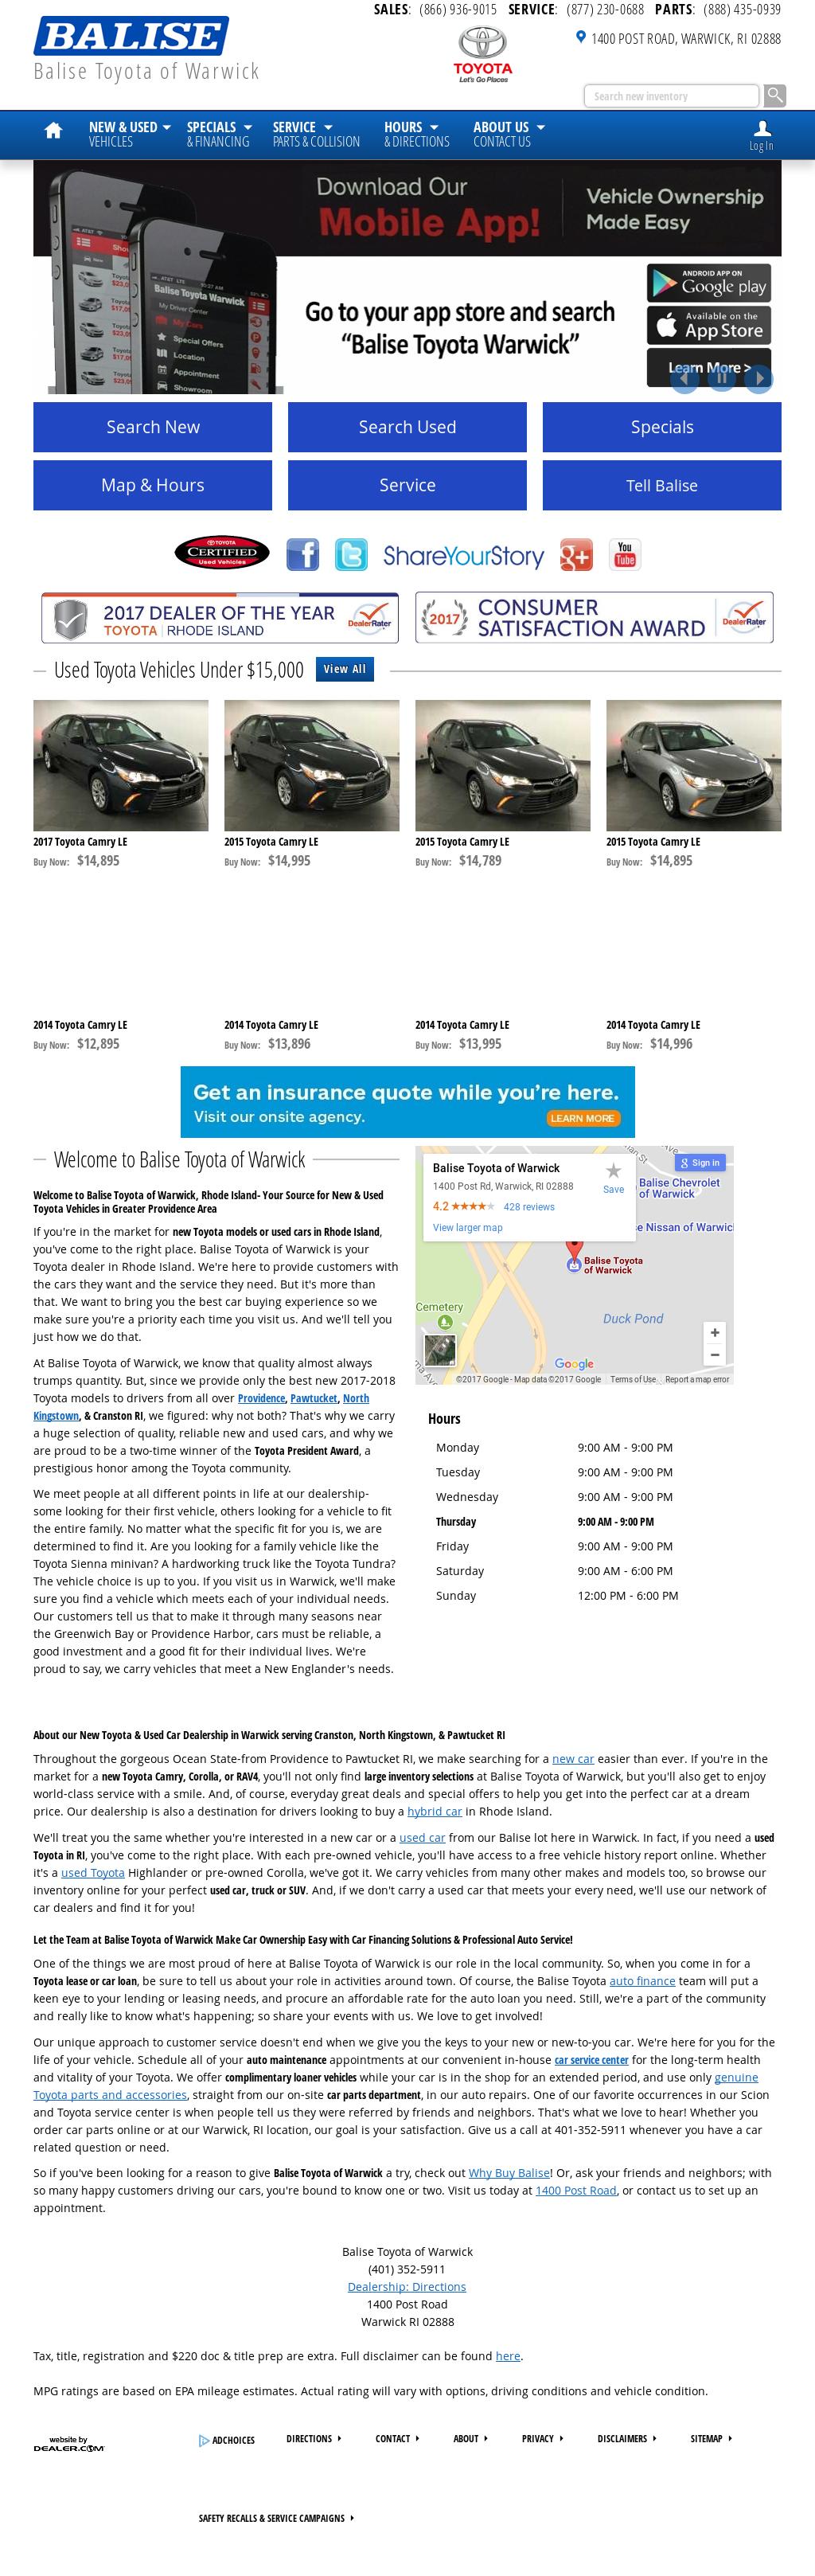 Balise Toyota Scion Of Warwick Website History